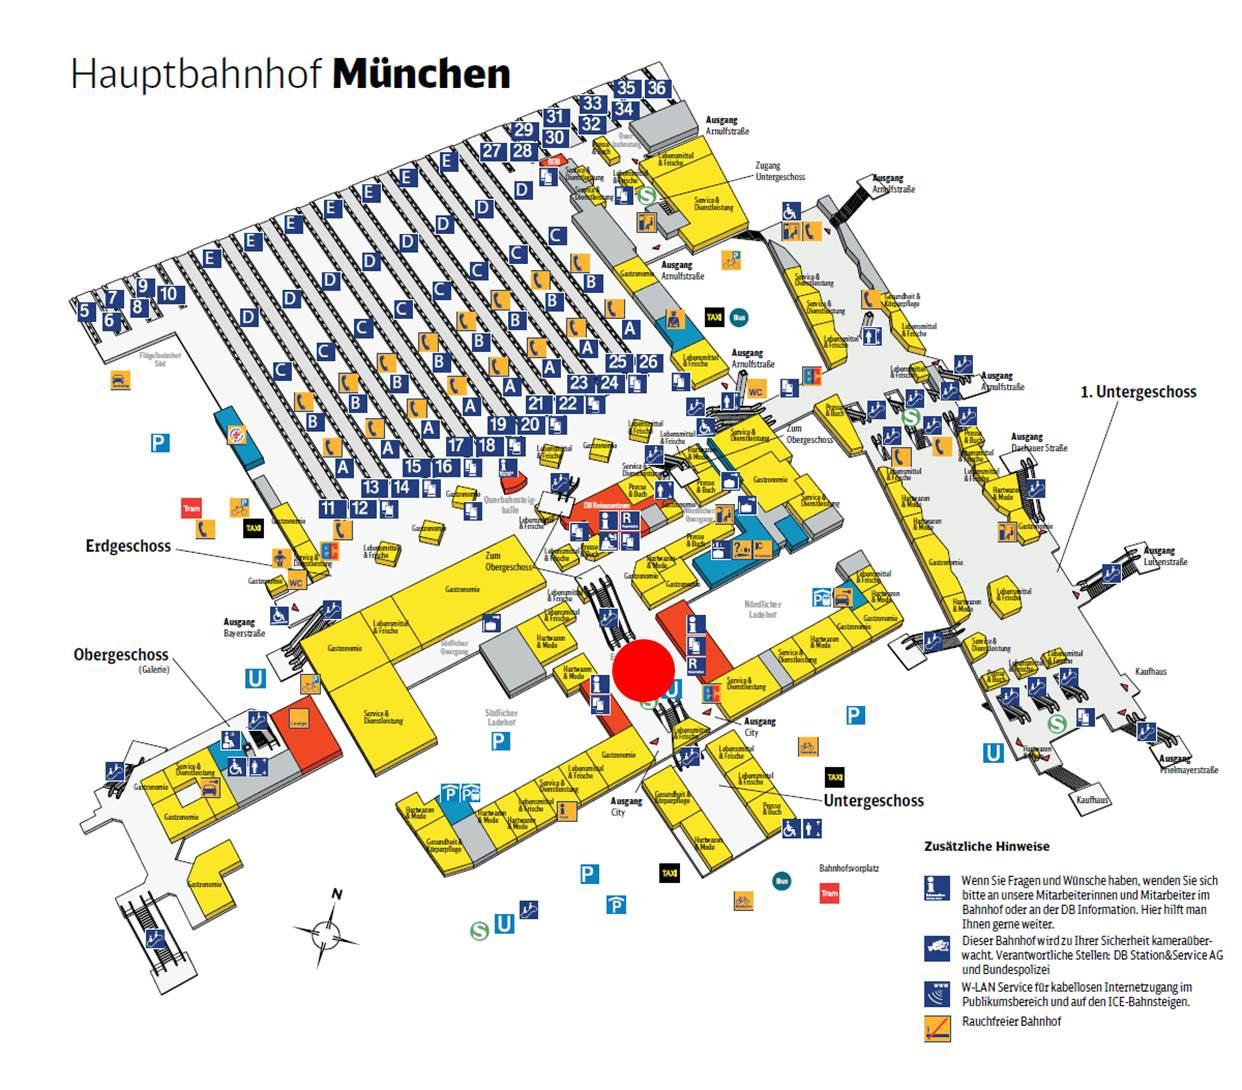 Bahnhof Munchen Gleisplan لم يسبق له مثيل الصور Tier3 Xyz